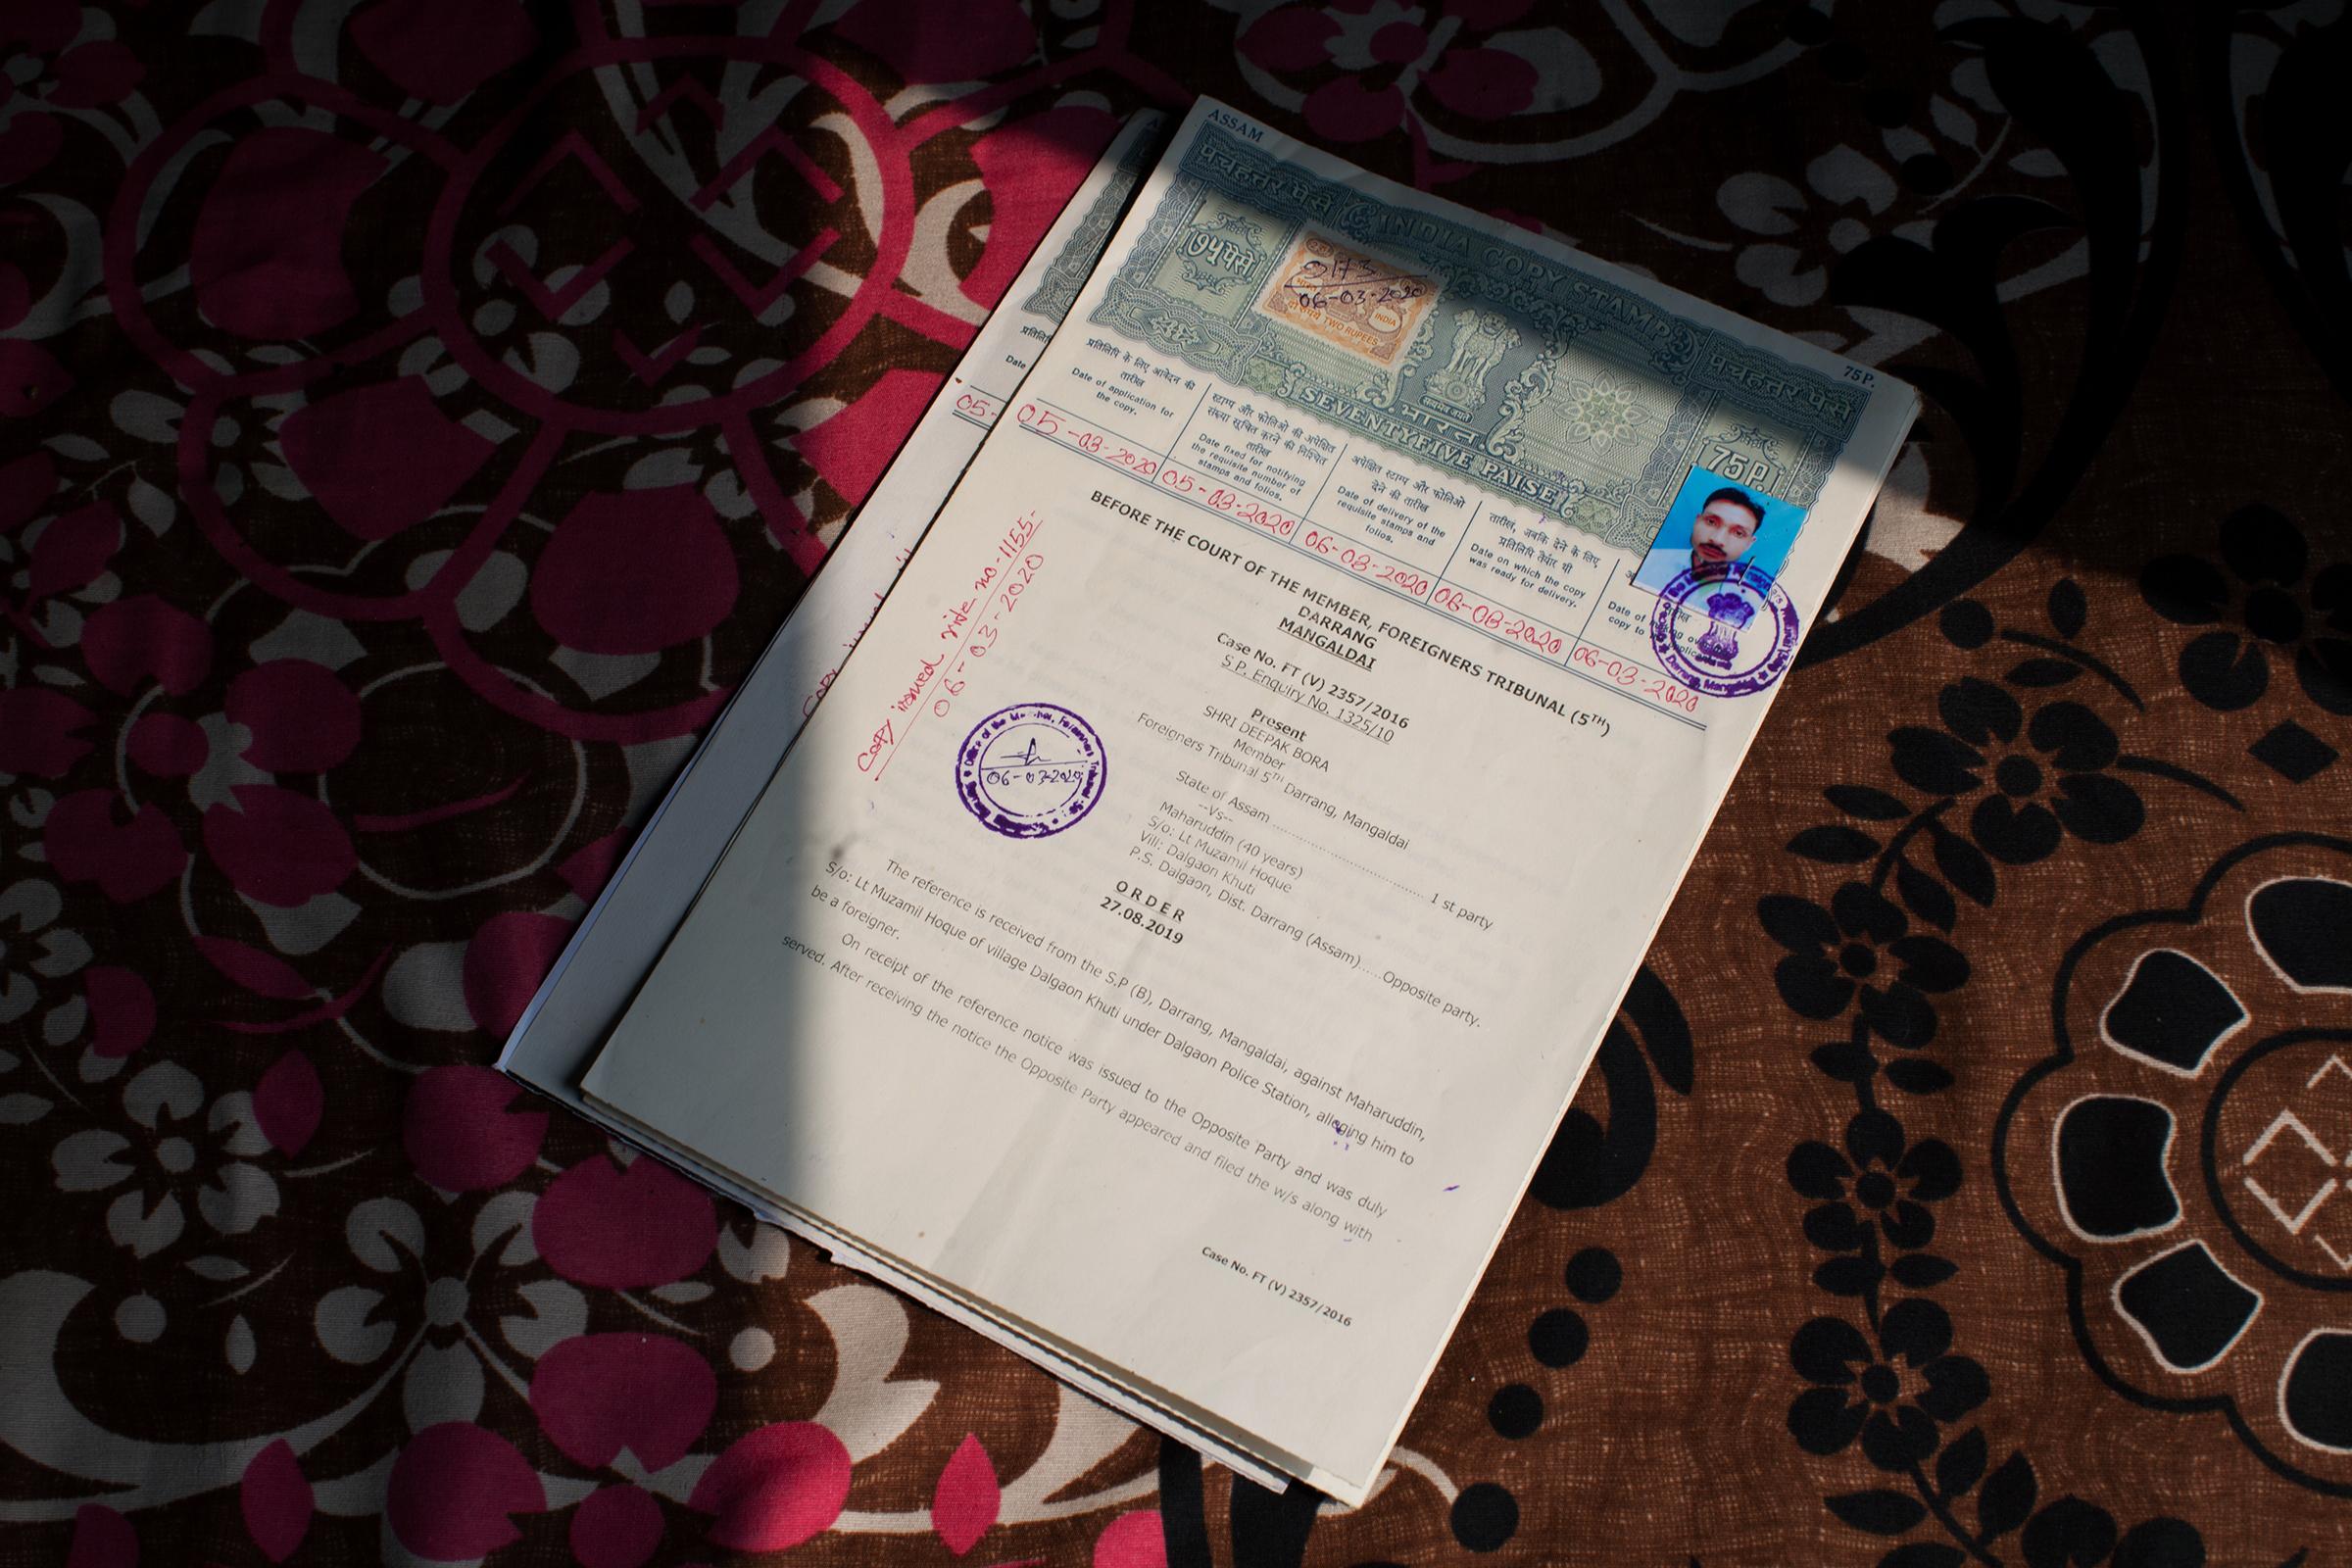 An order from a foreigners tribunal, a quasi-judicial body unique to Assam, declaring Mamtaj Begum's husband Mahuruddin a foreigner